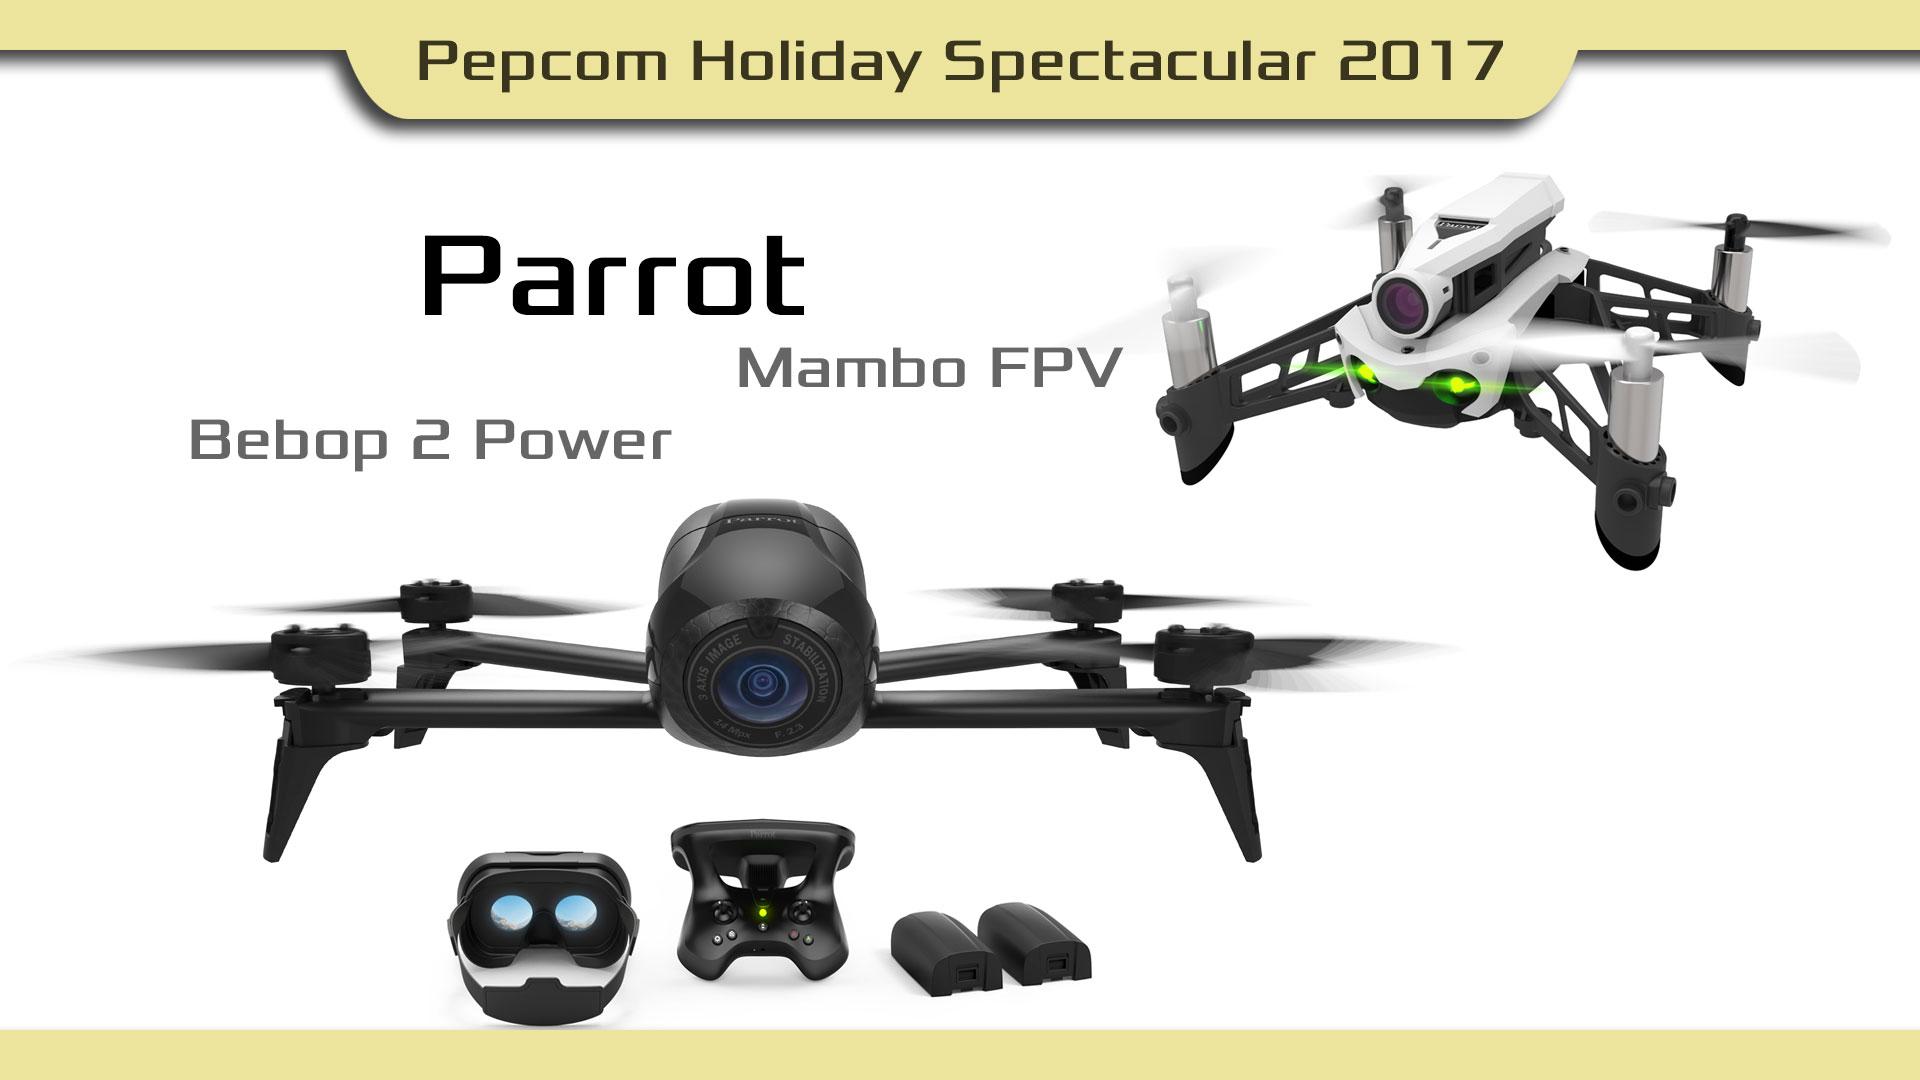 Parrot Bebop 2 Power - Mambo FPV